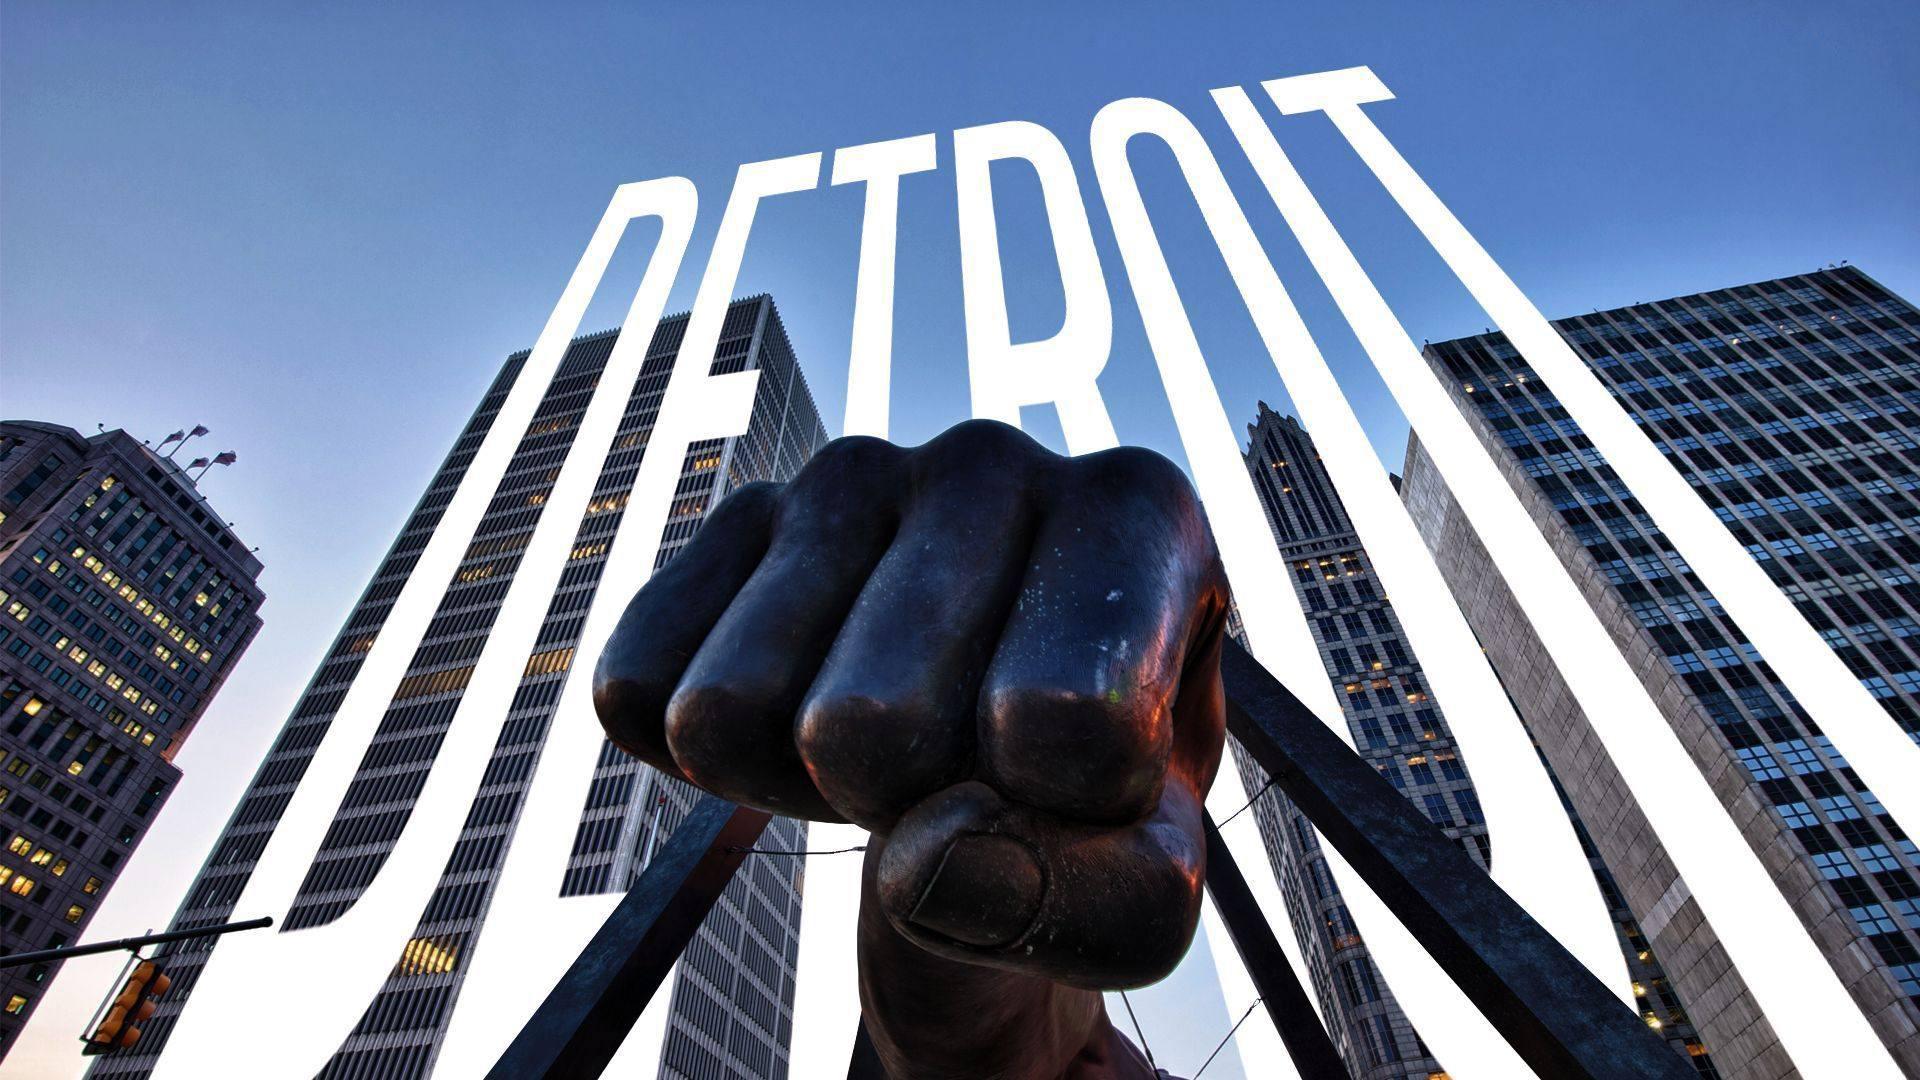 download Detroit Wallpapers HD 1920x1080